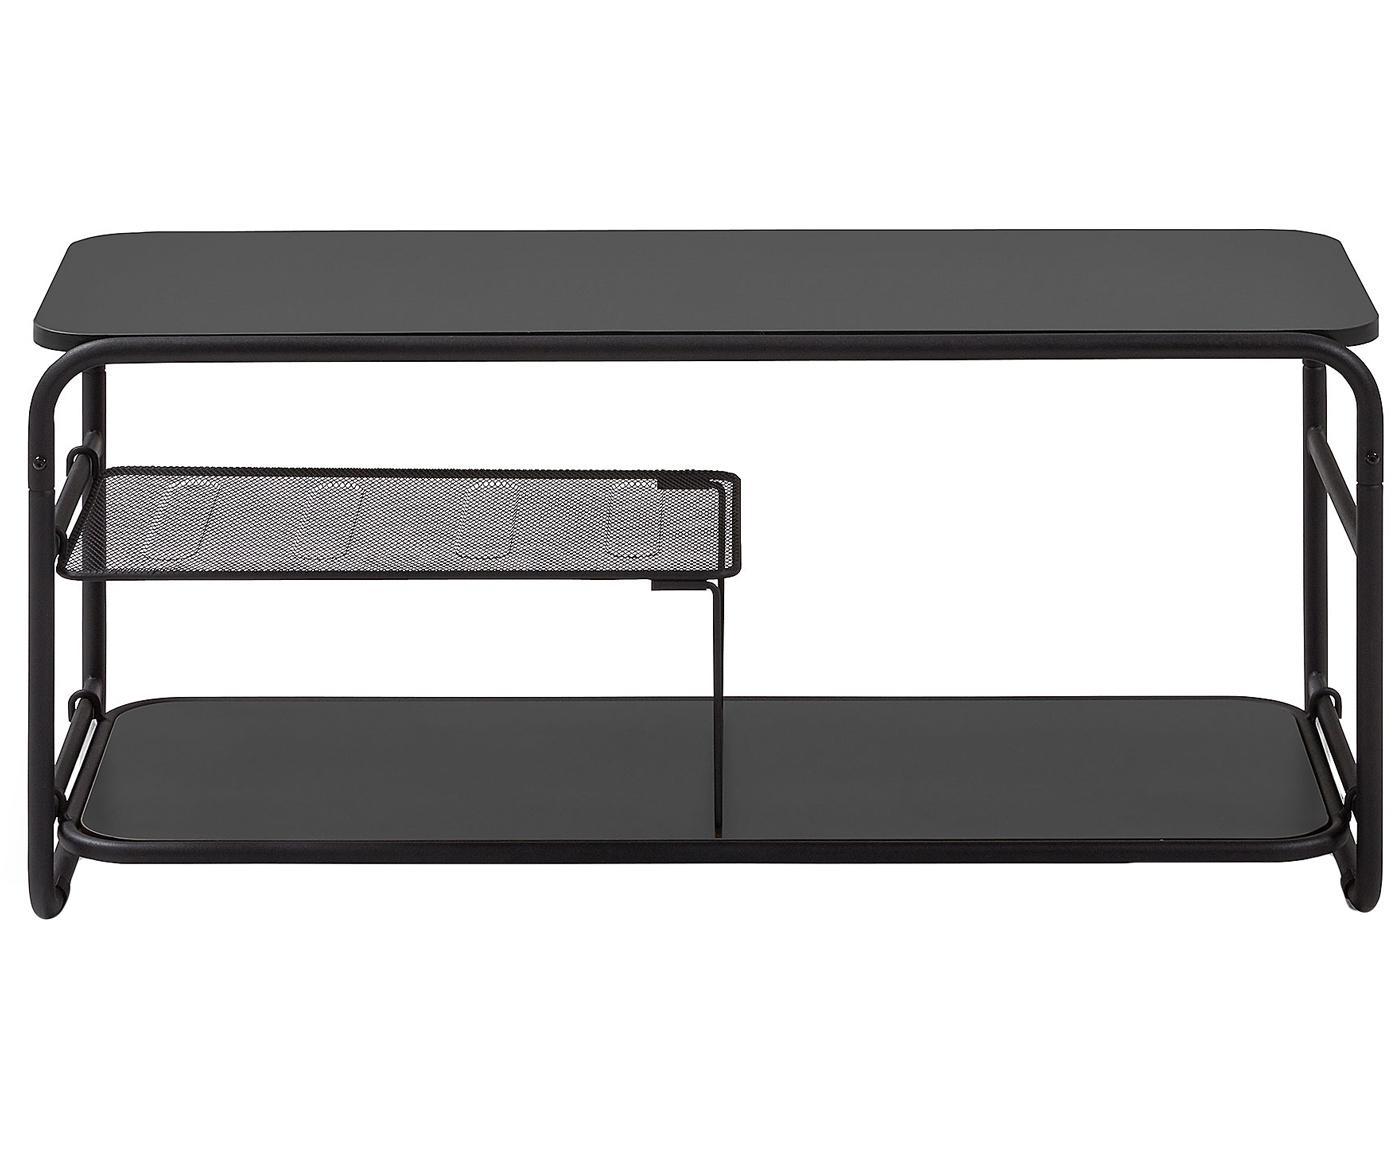 Schwarze TV-Konsole Academy aus Metall, Melamin, Metall, Schwarz, 98 x 46 cm